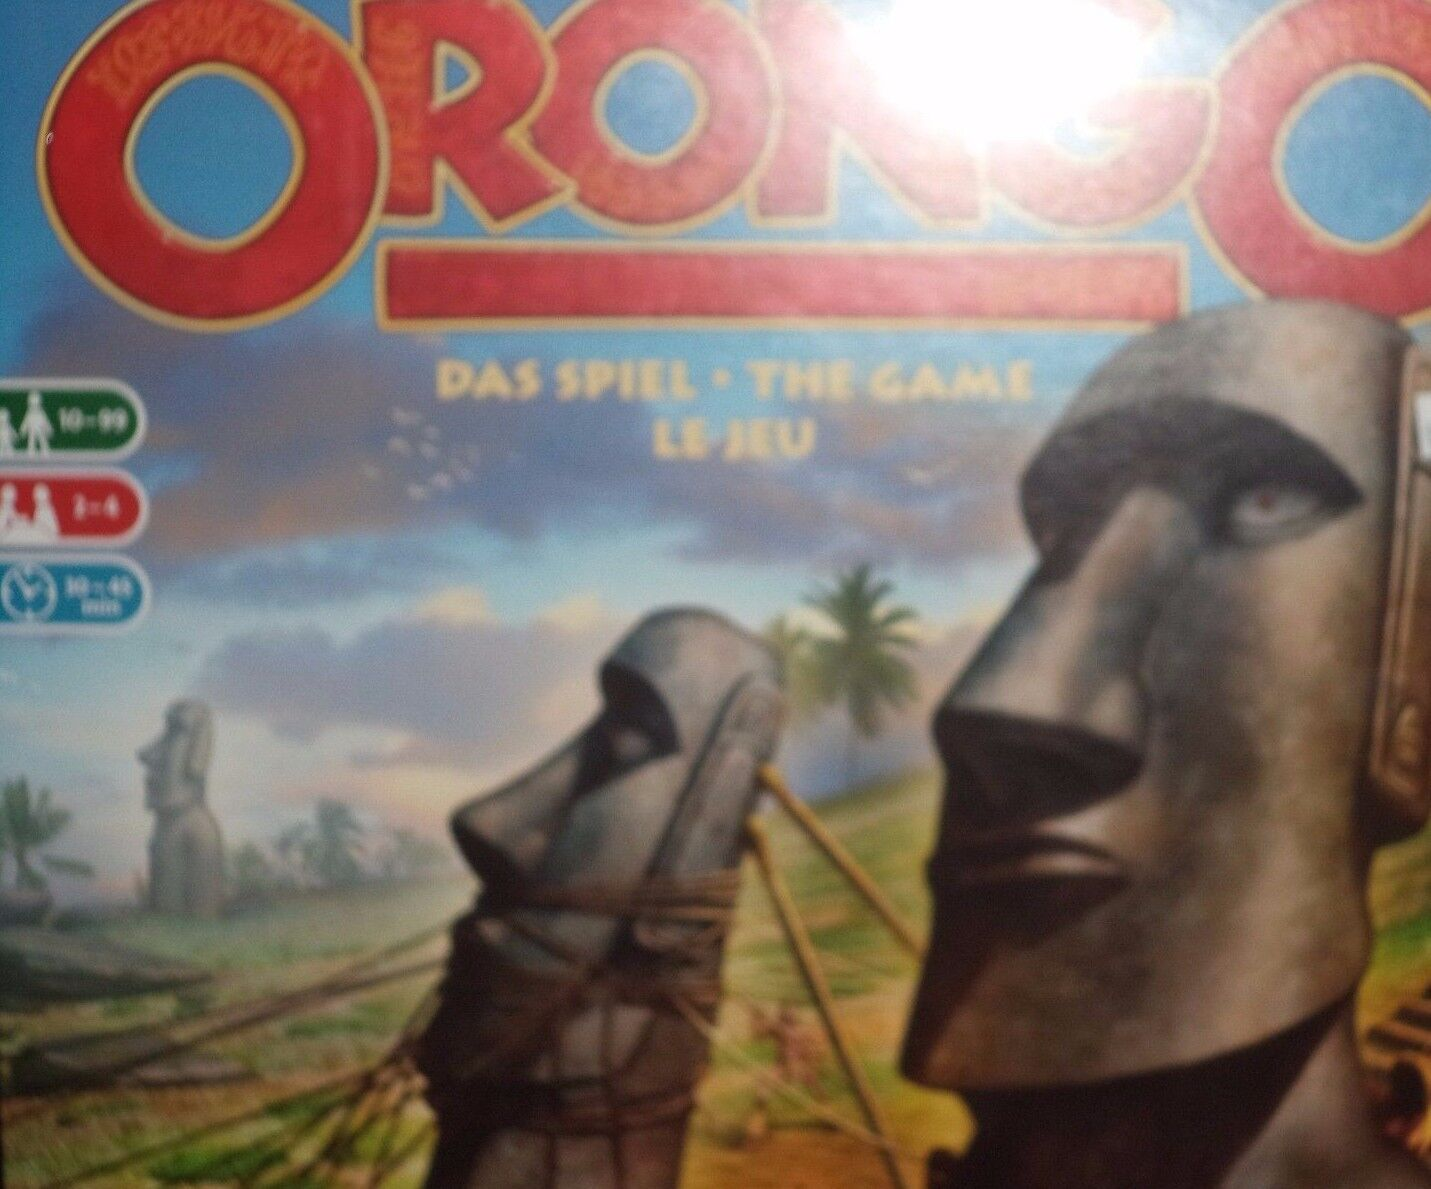 Goldngo - ravensburger spielen brettspiel neu